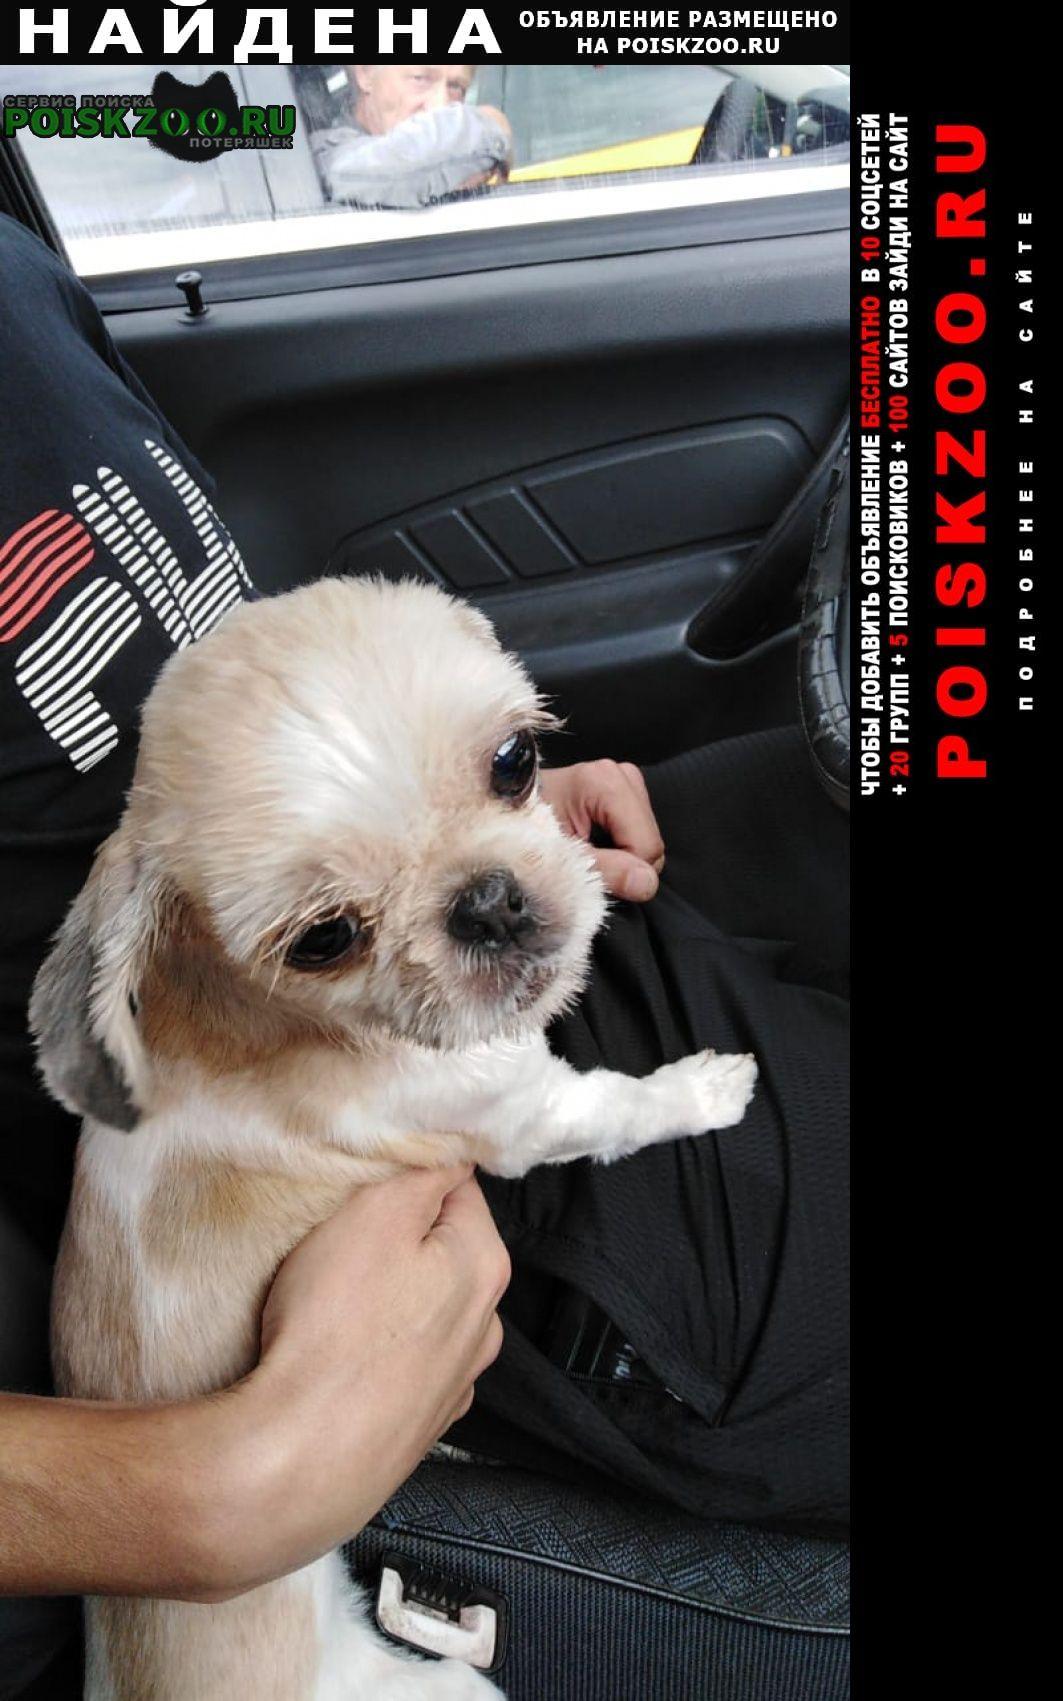 Михнево Найдена собака около д. дубнево